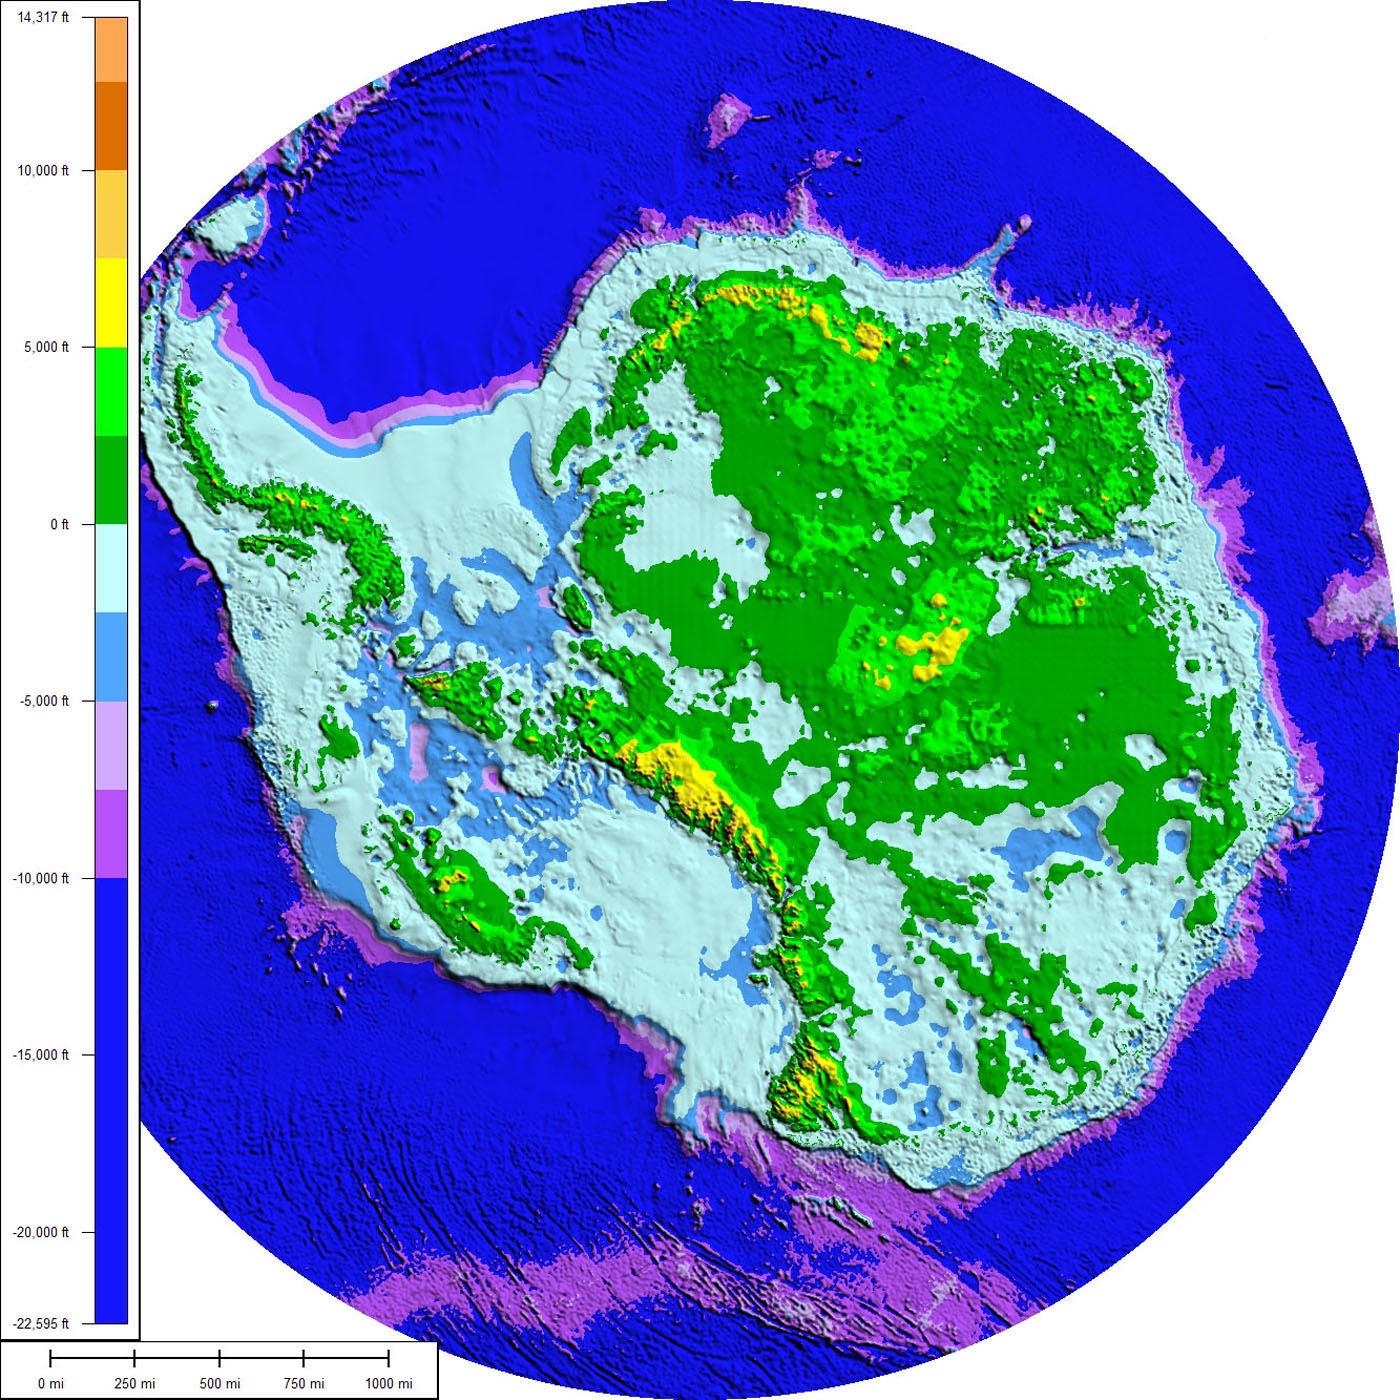 http://upload.wikimedia.org/wikipedia/commons/b/b7/AntarcticBedrock.jpg